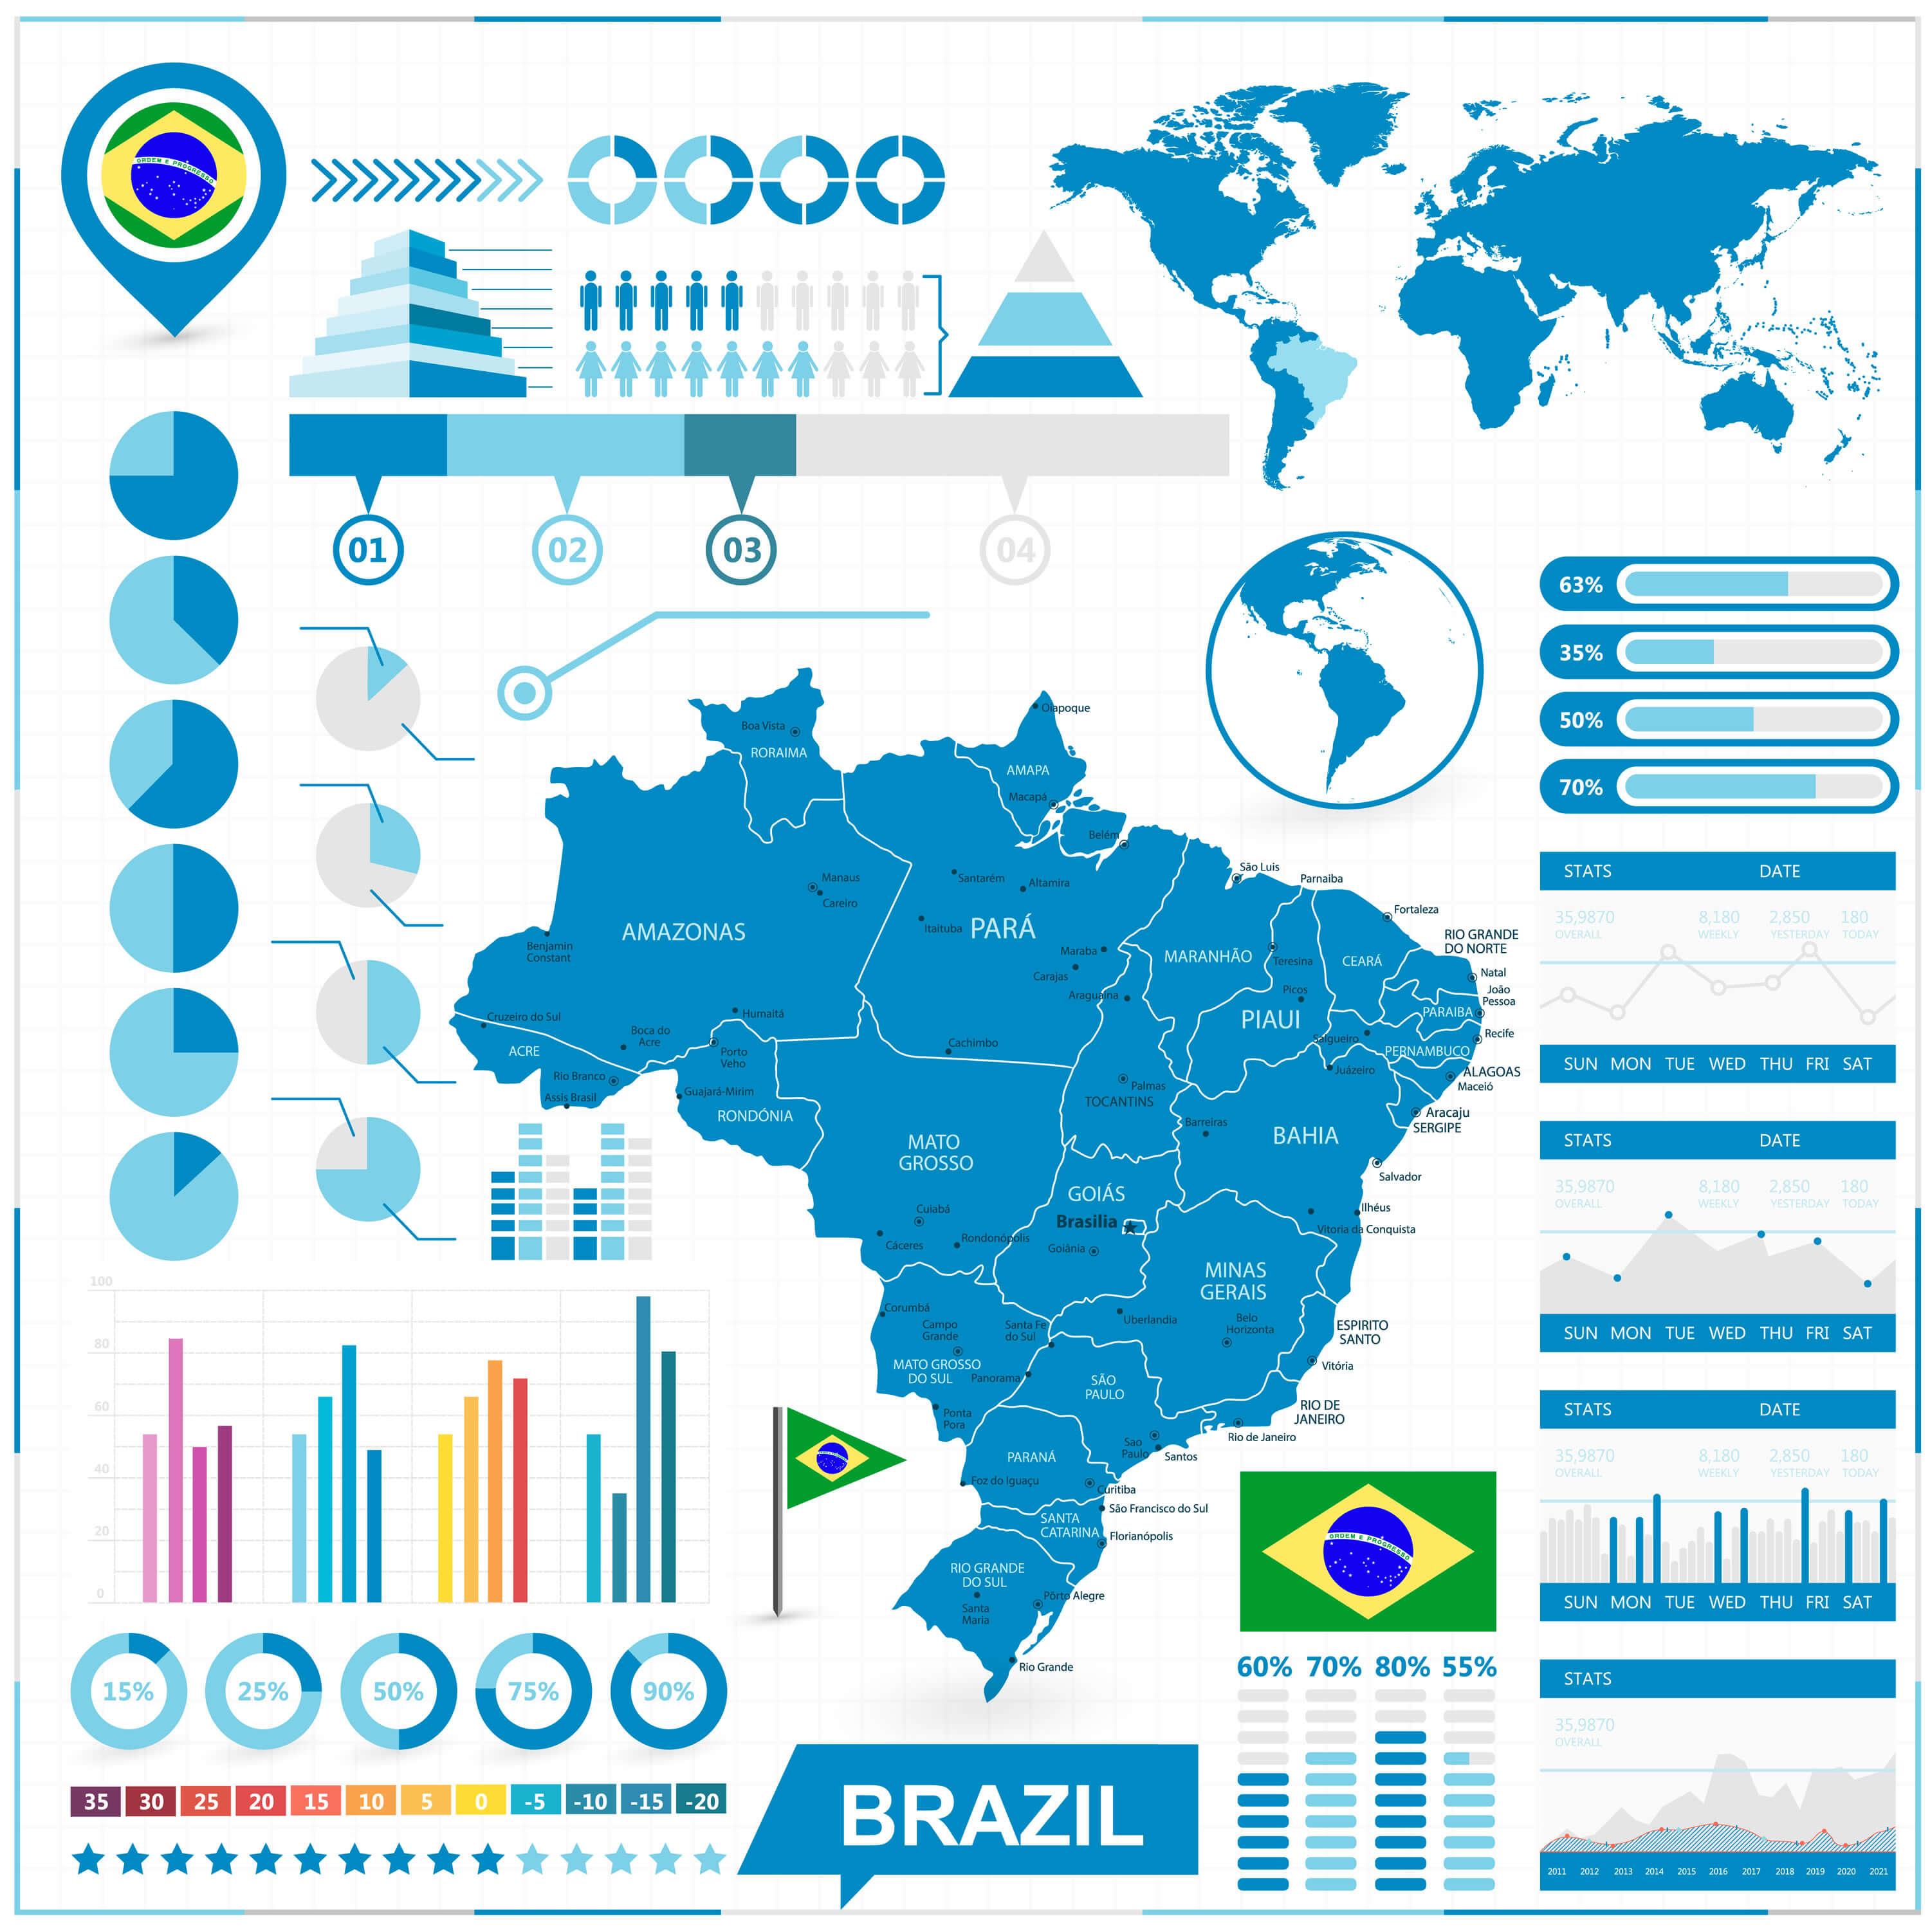 Brazil Infographic Map